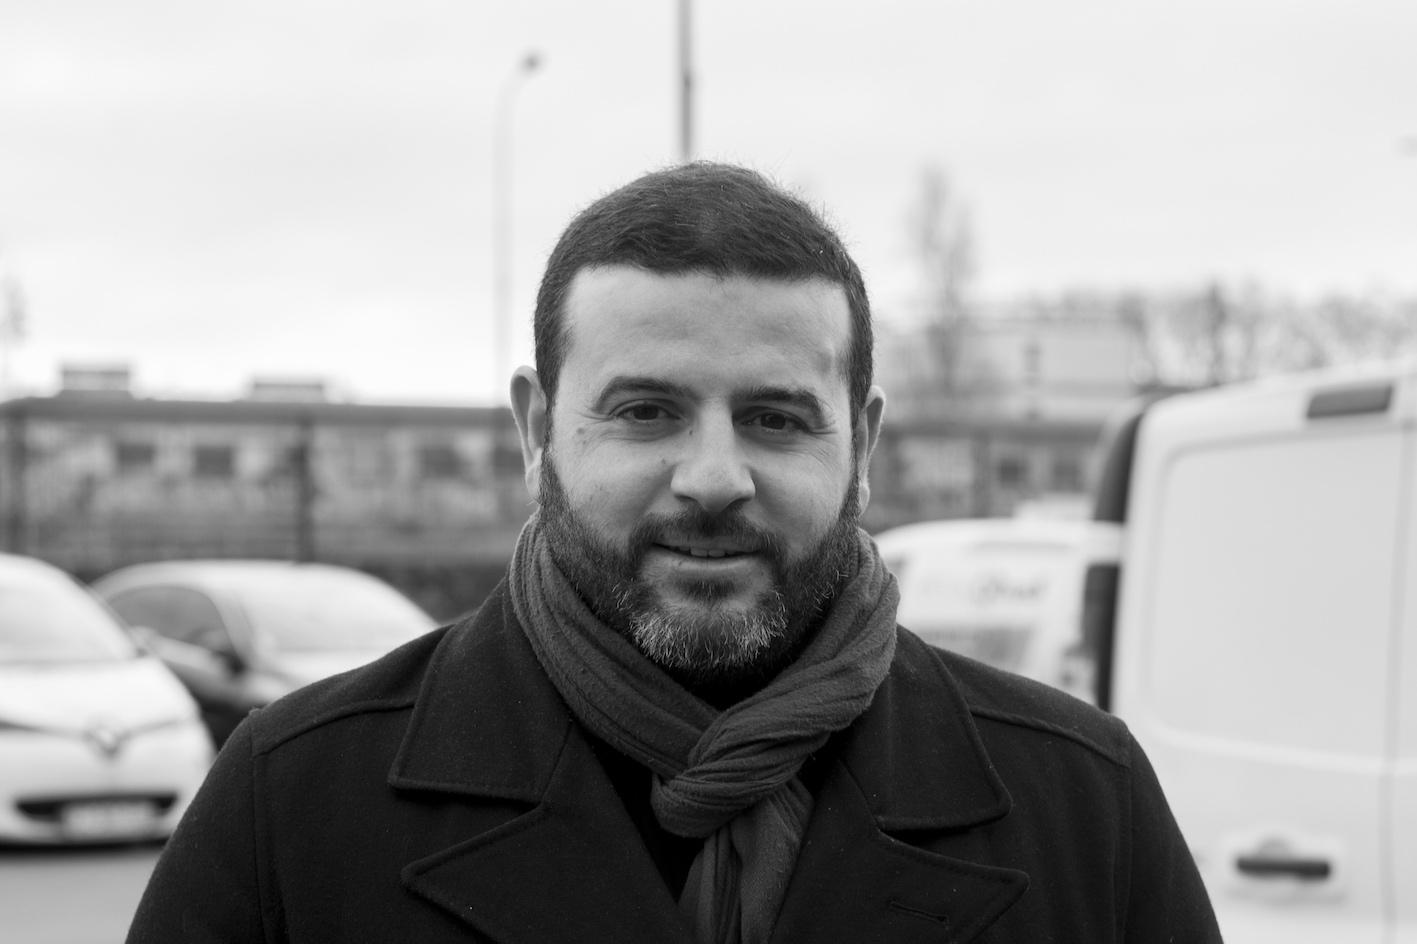 Impact Croissance Ecolotrans véhicule vos valeurs Yacine Kara